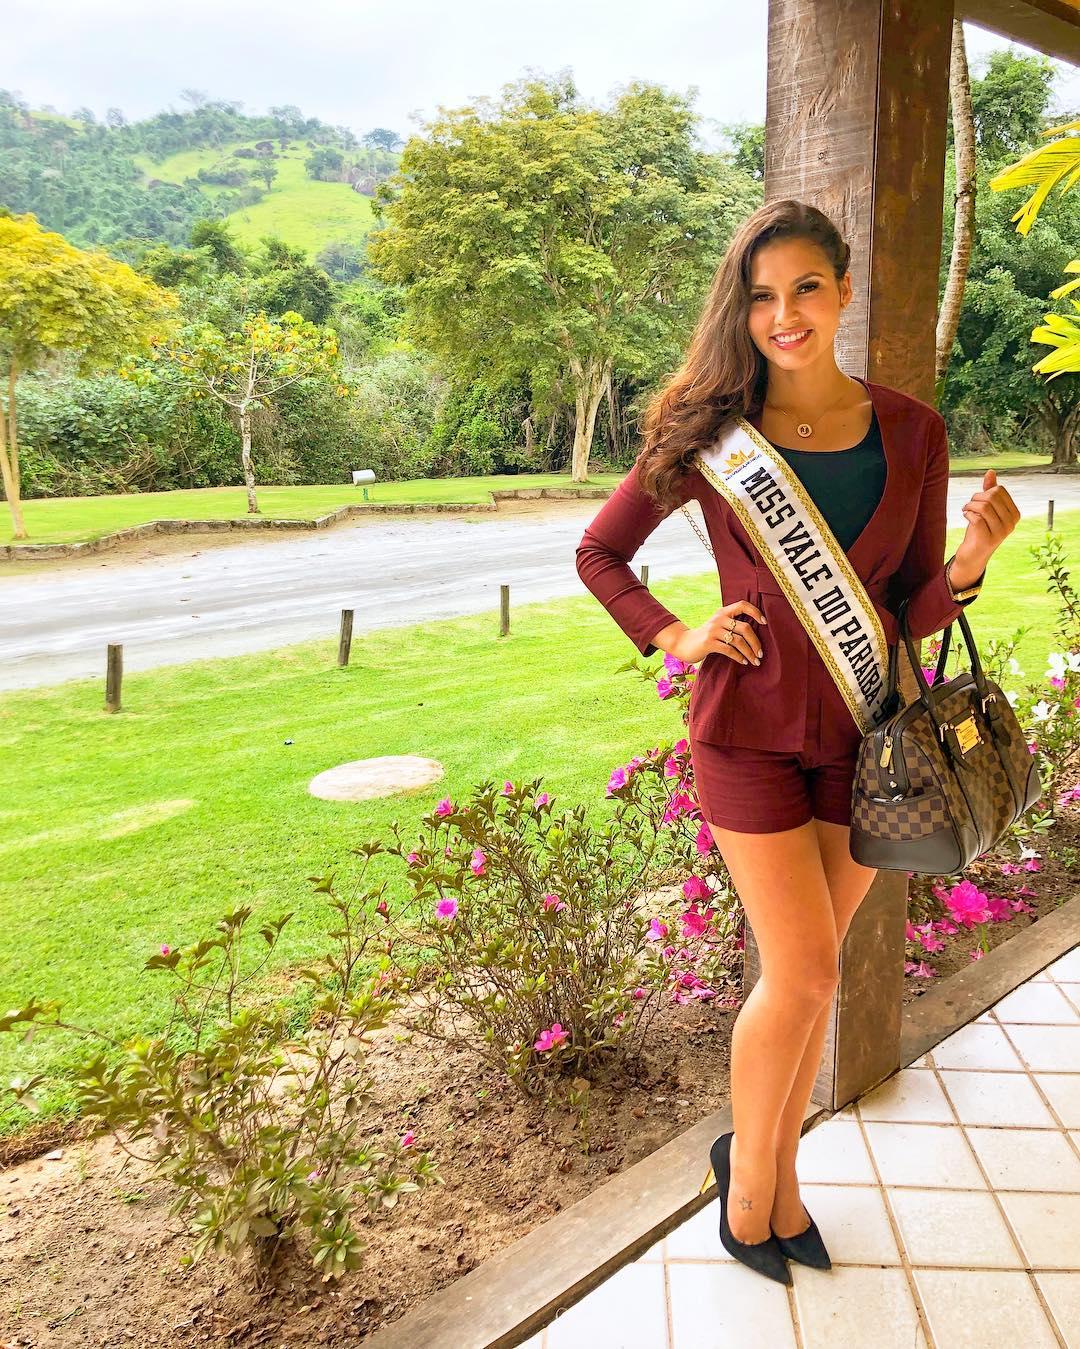 jessica caroline costa, miss supranational sao paulo 2020/miss grand paraiba 2019/miss vale do paraiba mundo 2018. - Página 3 38638610